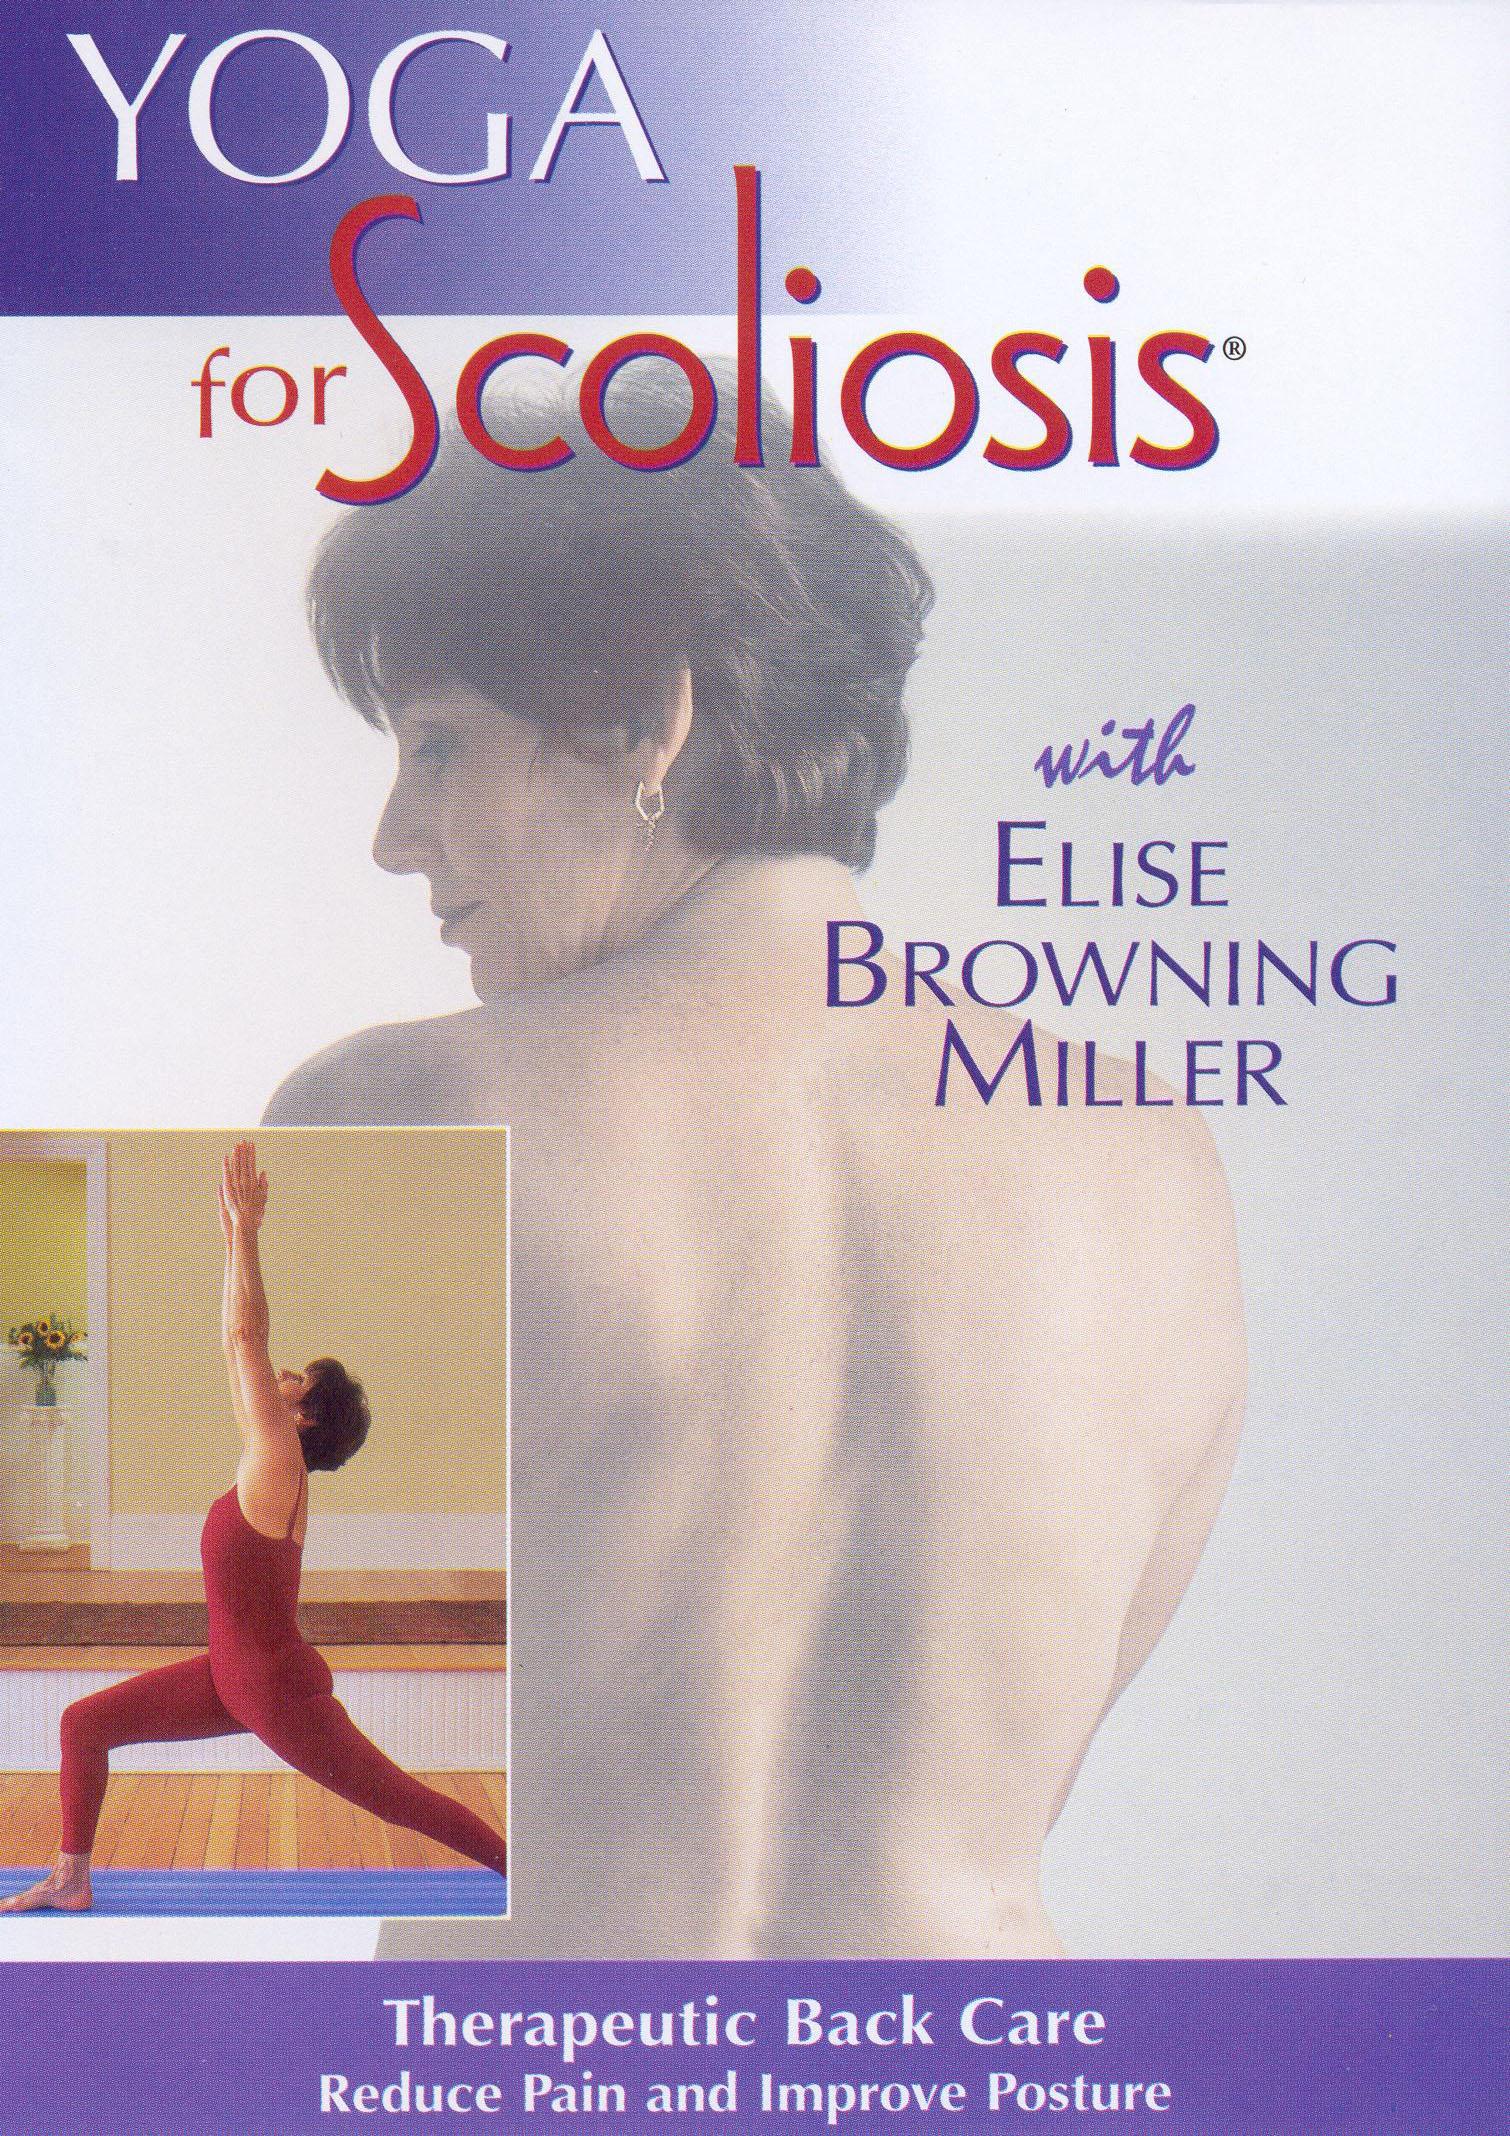 Elise Browning Miller: Yoga for Scoliosis